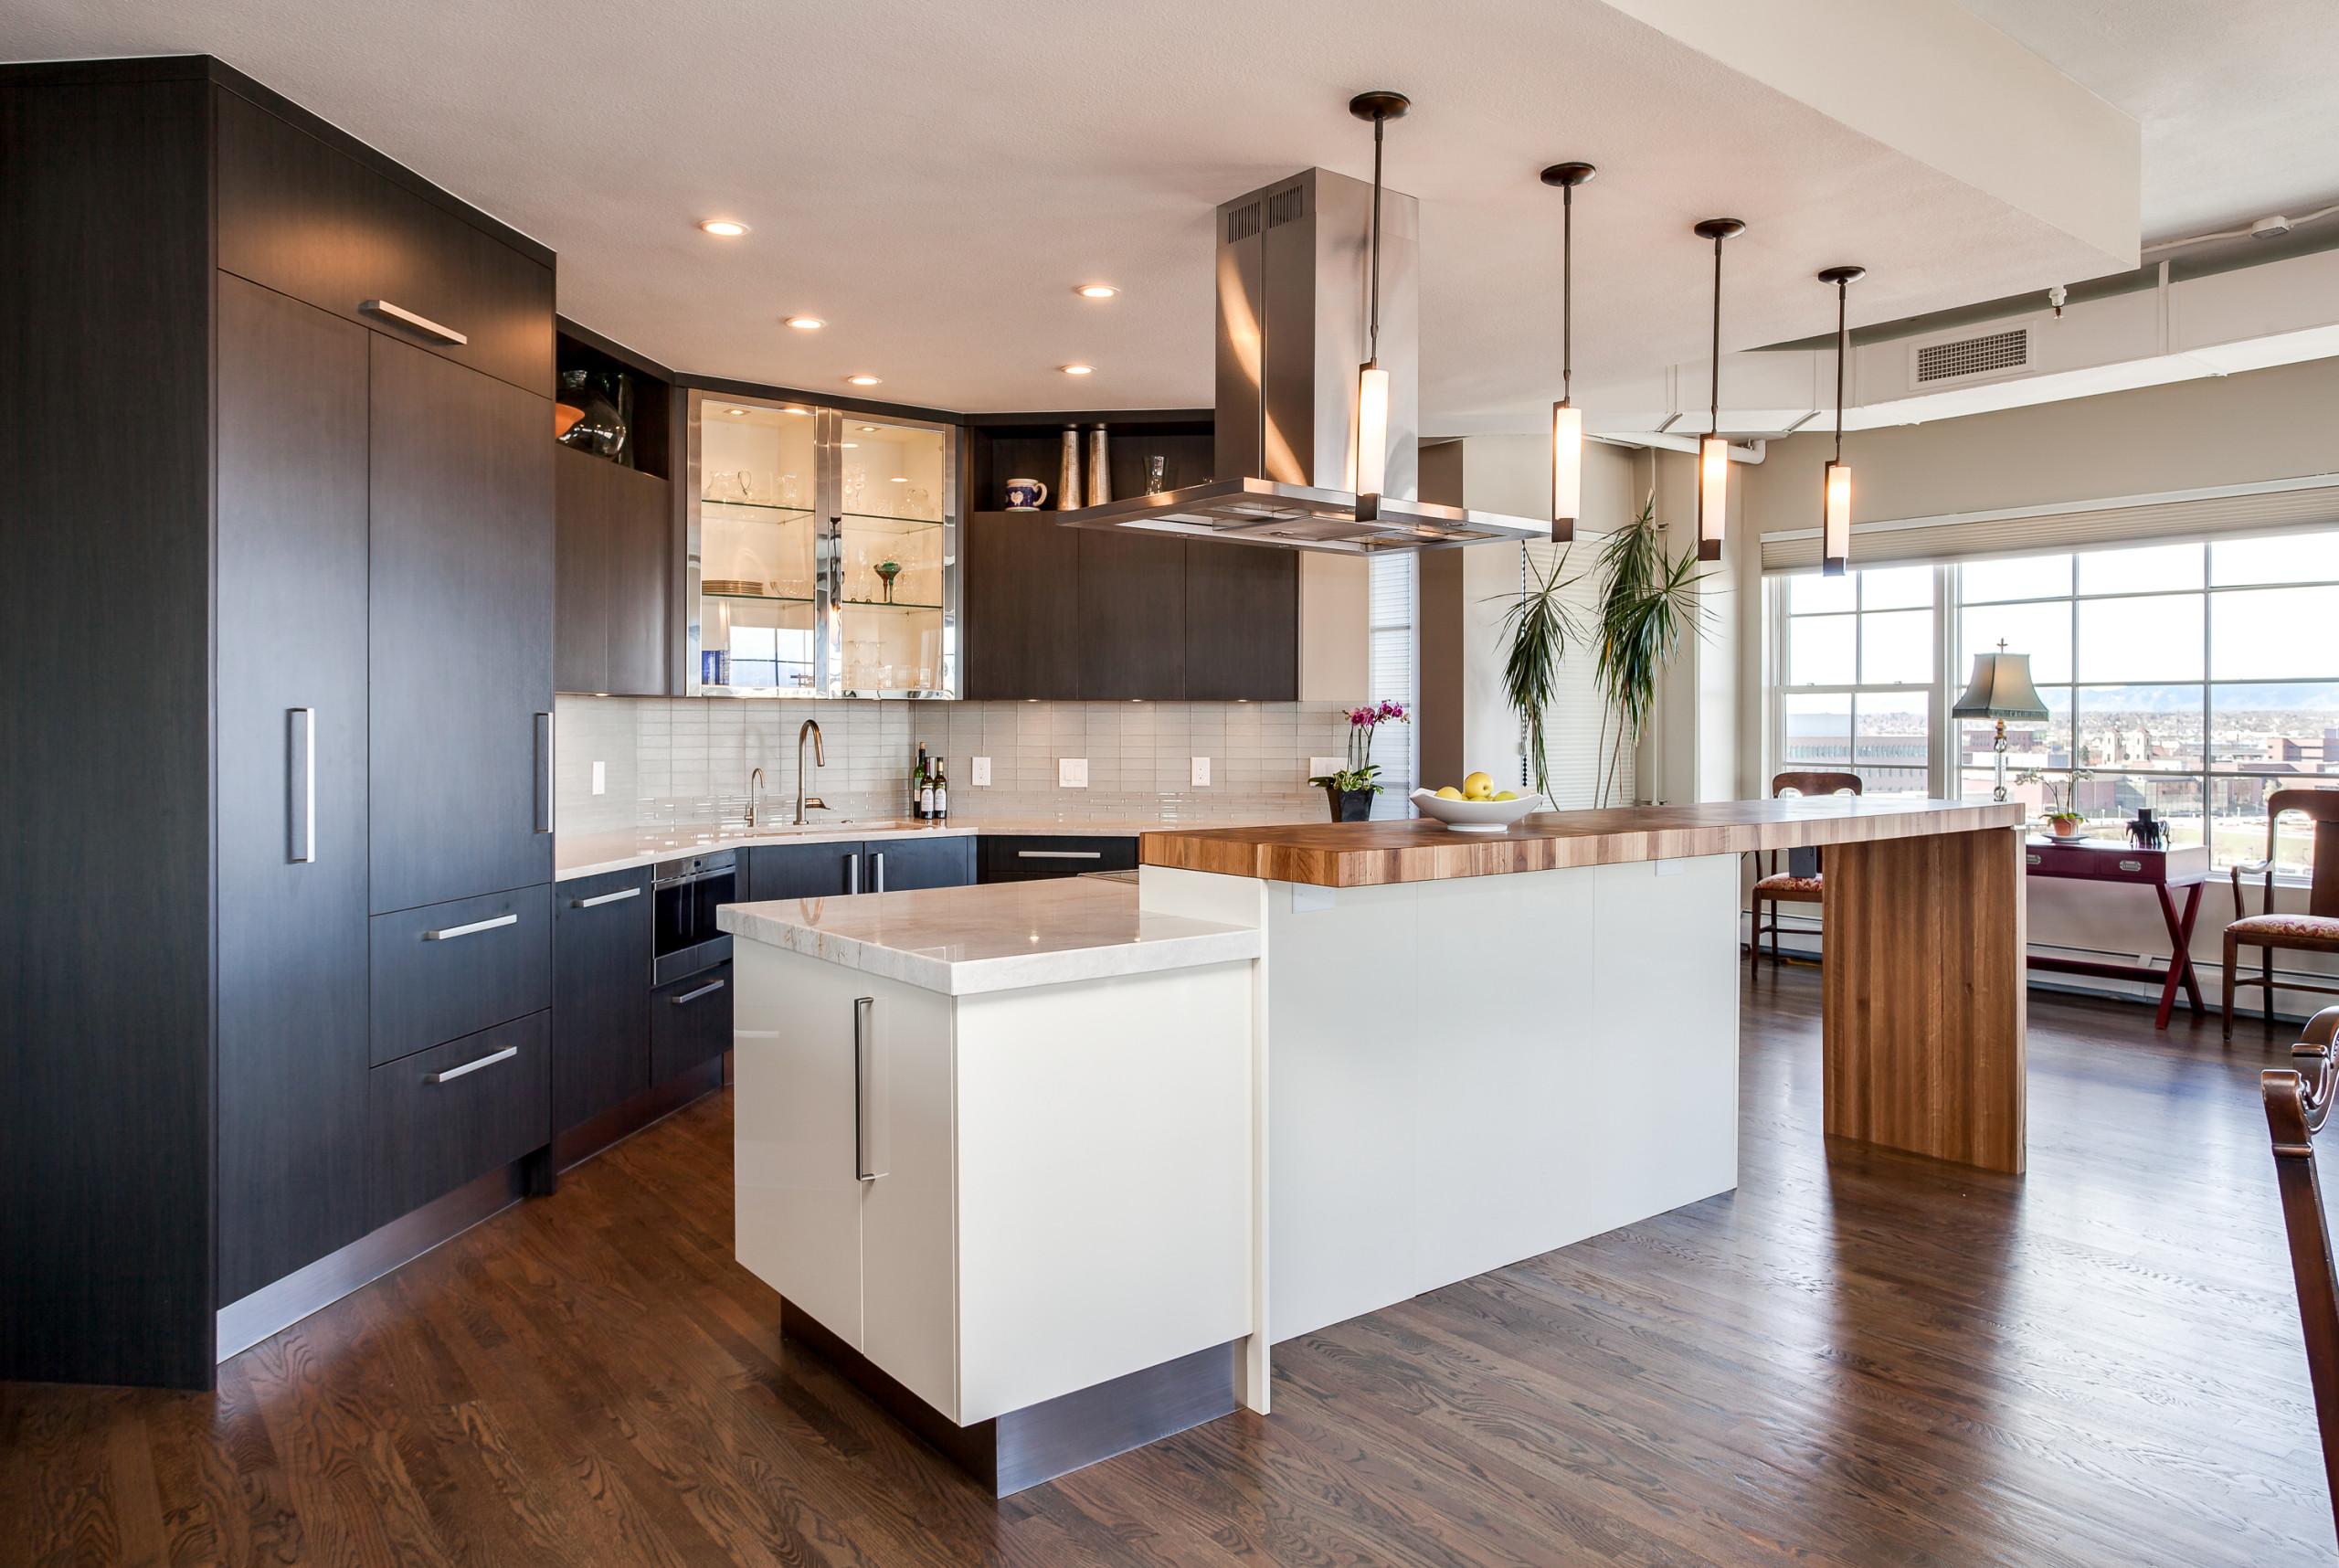 Denver Palace Loft Kitchen Remodel in LoDo